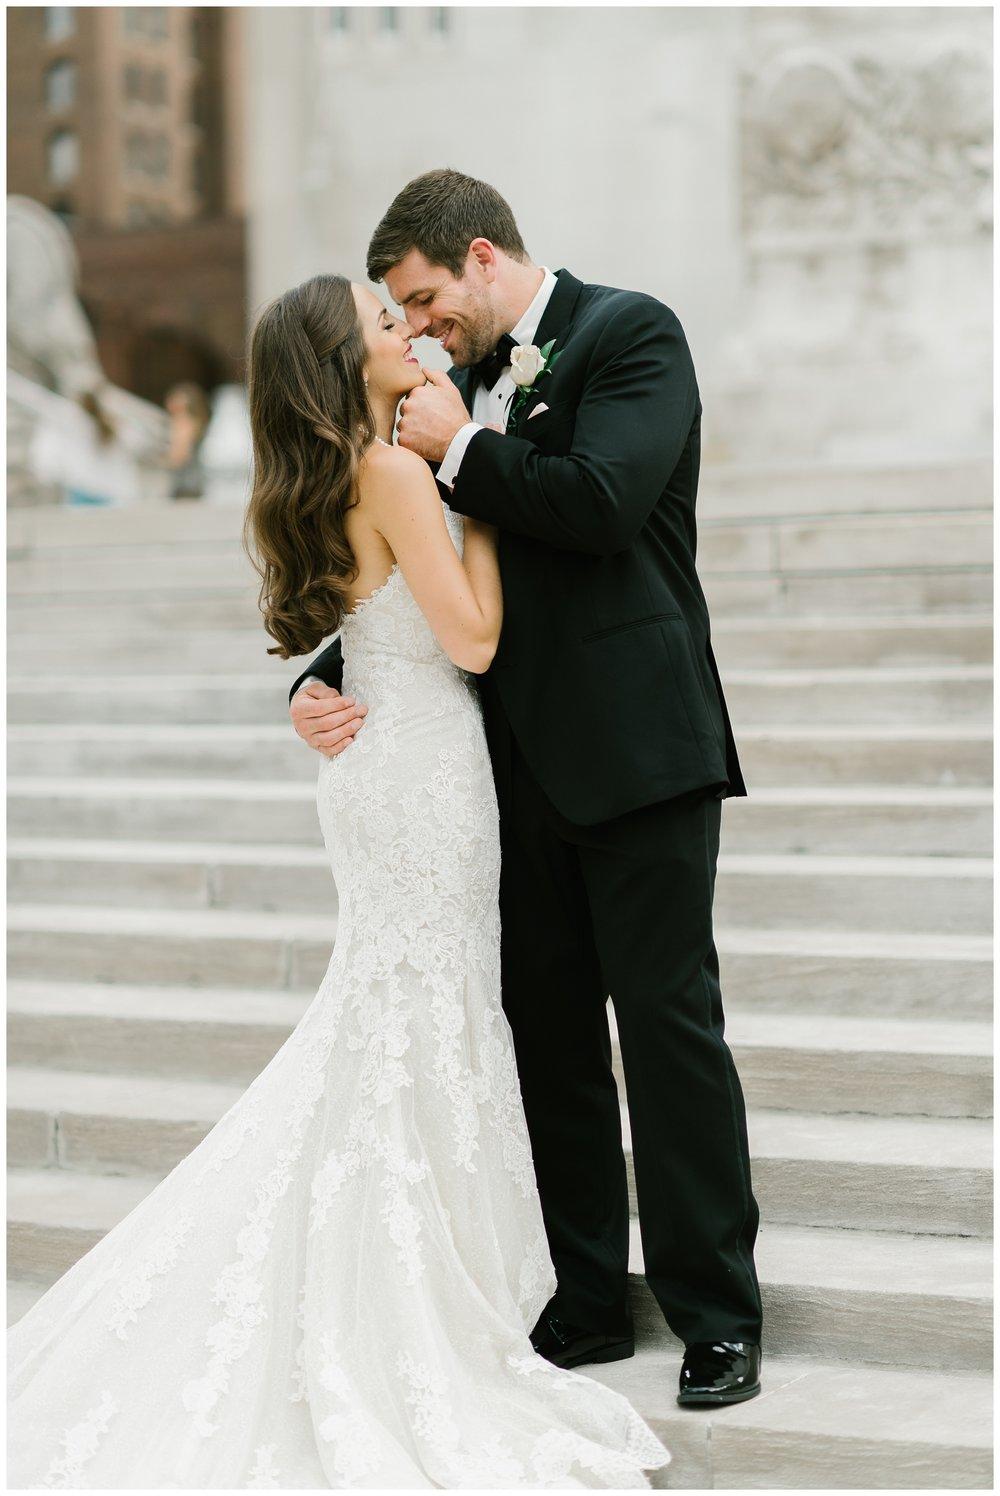 Rebecca_Bridges_Photography_Indianapolis_Wedding_Photographer_6845.jpg